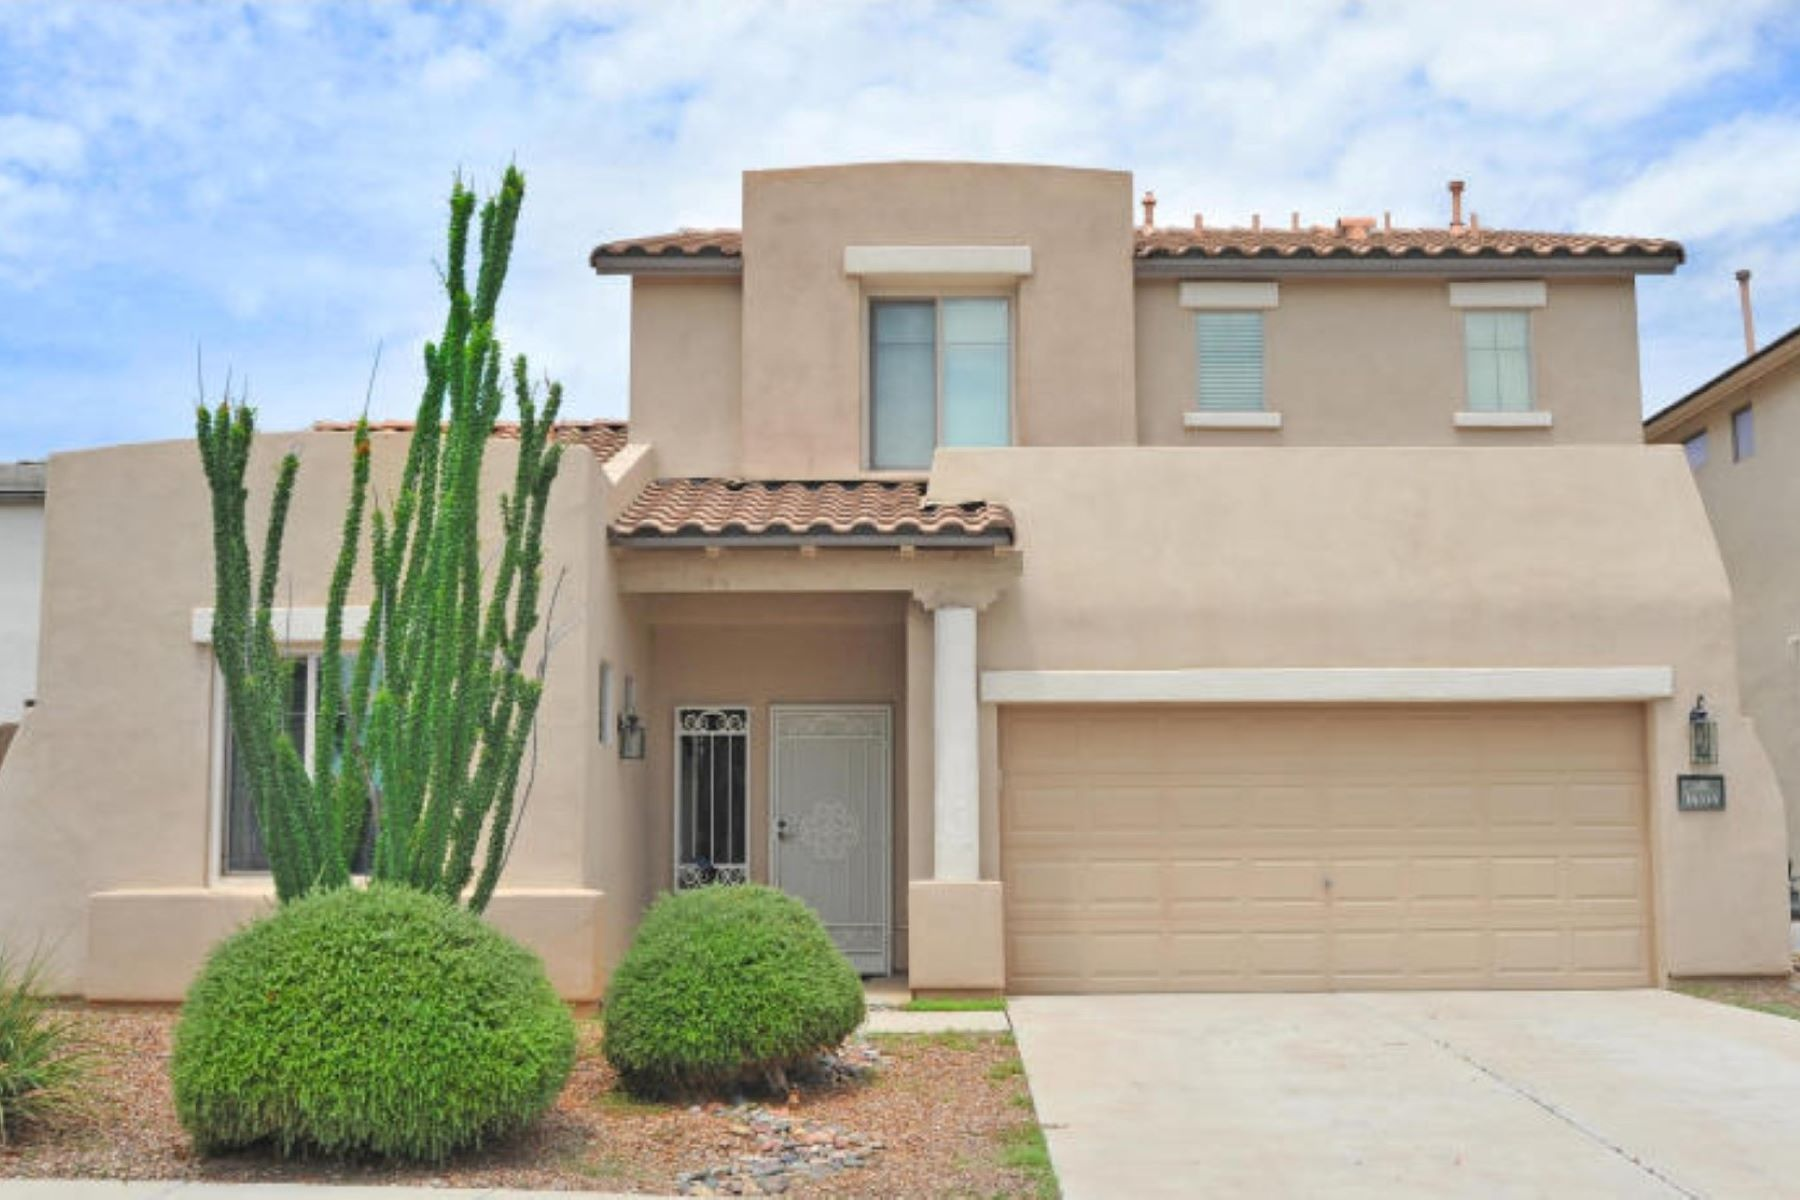 Single Family Home for Sale at A Delightful Two-Story Home 14334 S Avenida Del Picea Sahuarita, Arizona, 85629 United States